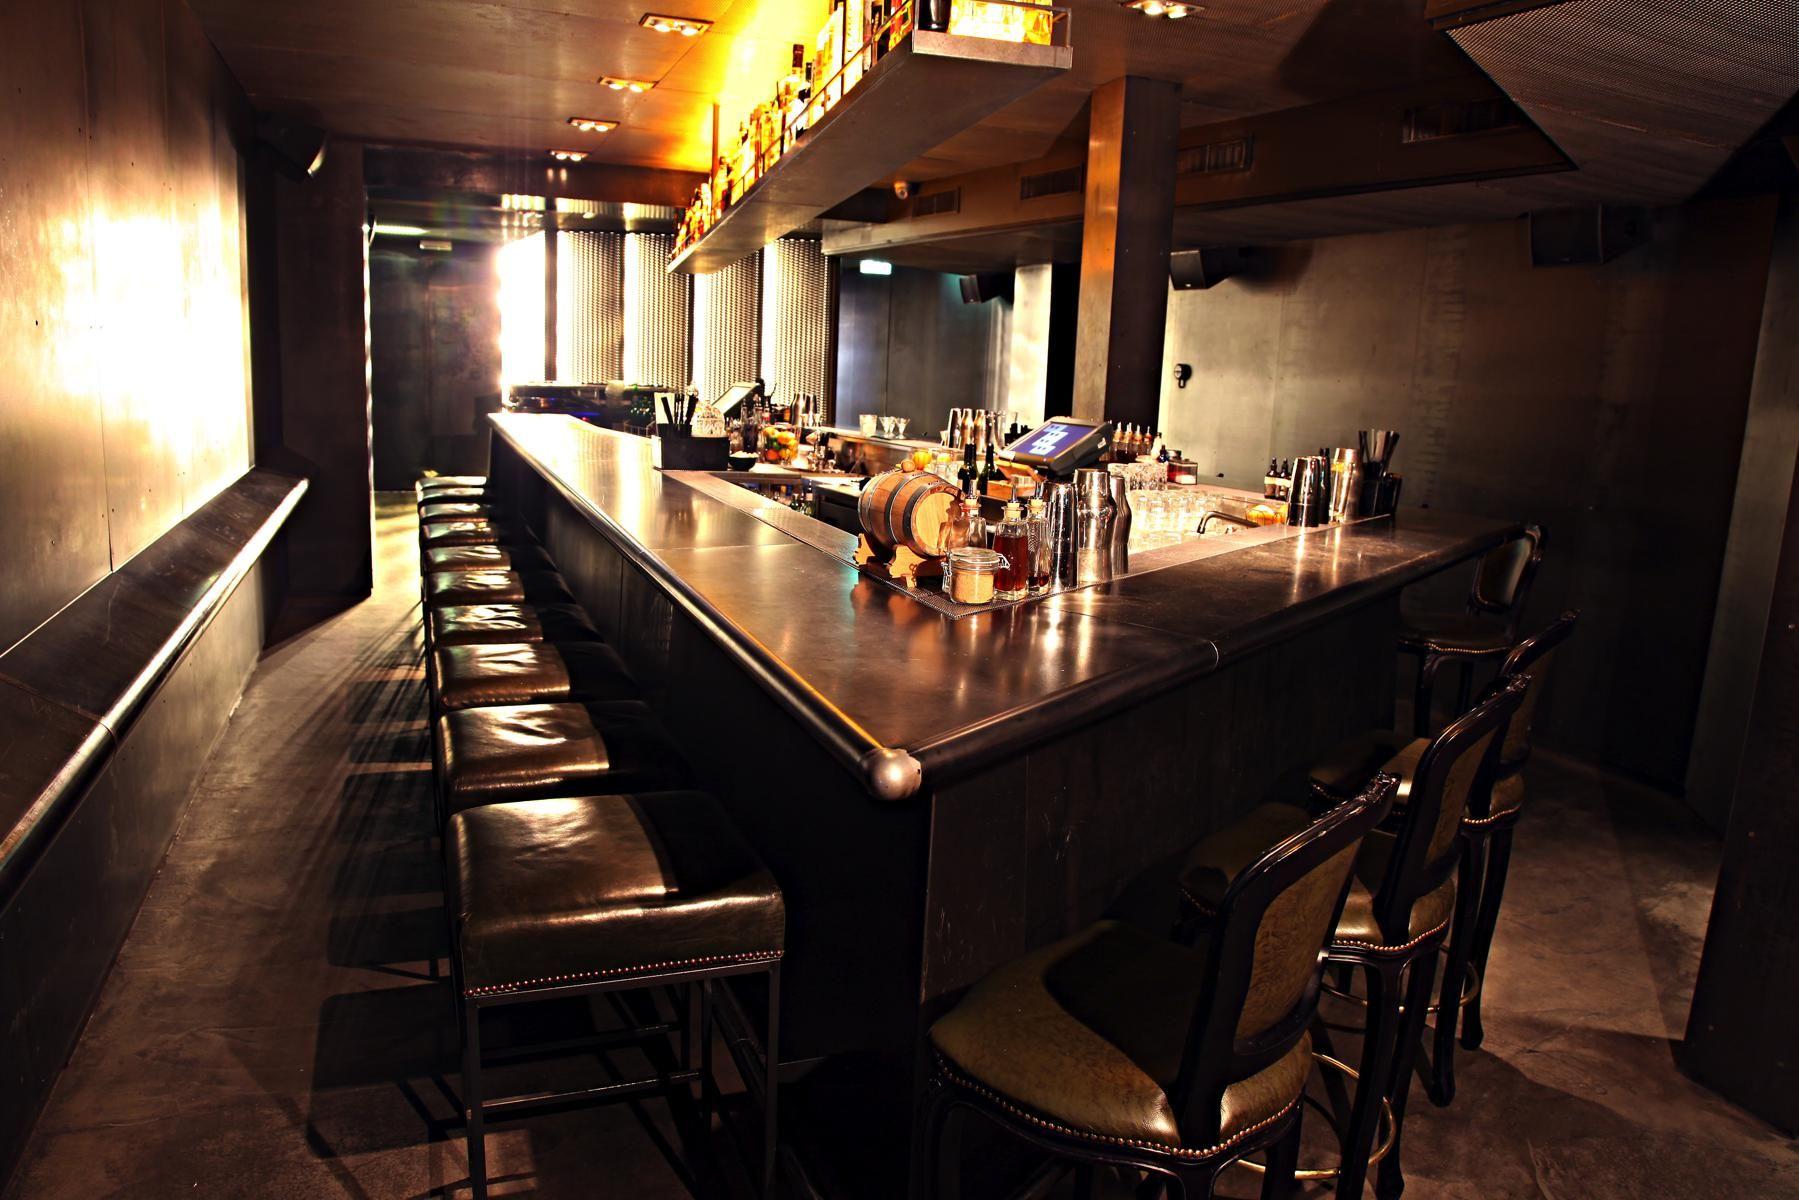 Secret Kitchen The Butcher Amsterdam : the butcher bar amsterdam - Google zoeken Hotspots in Amsterdam - Bar design awards ...